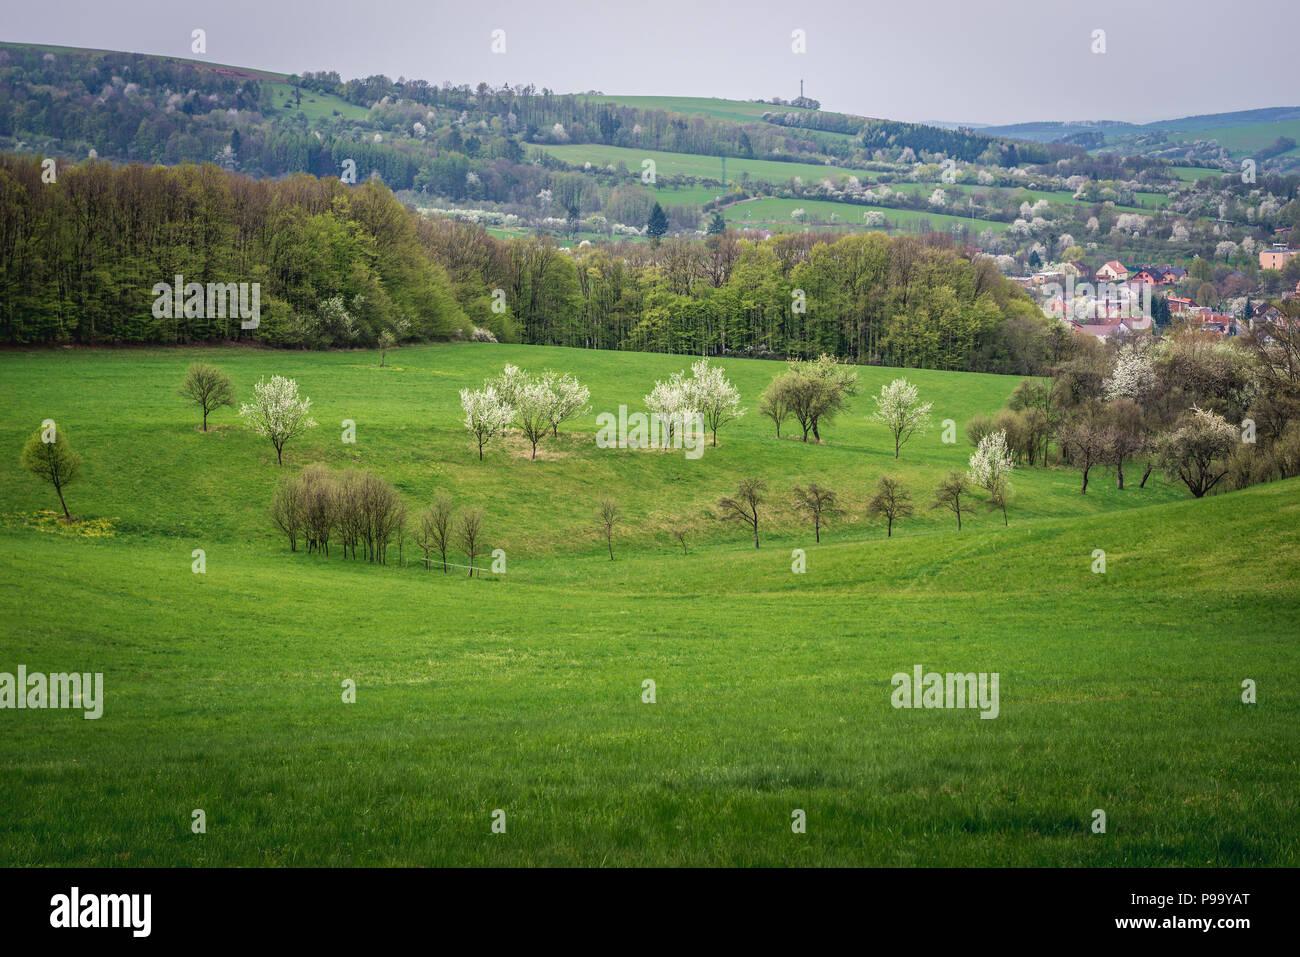 Landscape in Breznice village near Zlin City in Czech Republic - Stock Image